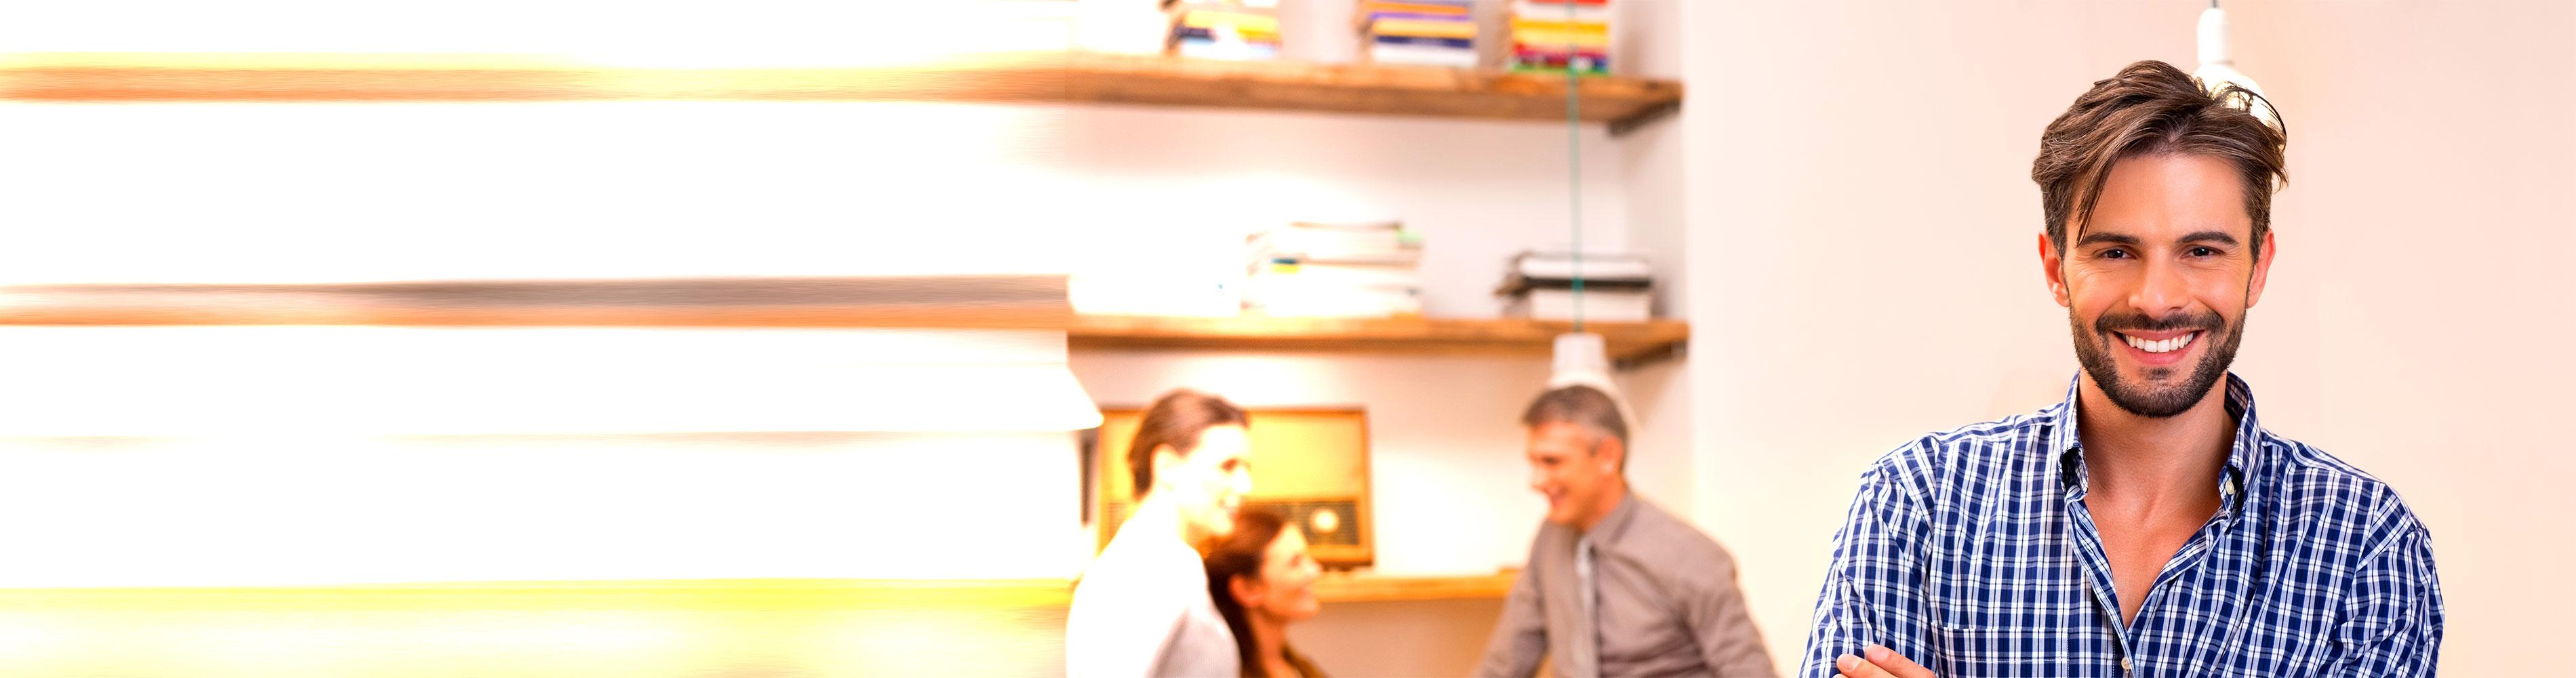 Praxis kaufen verkaufen Praxisbörse Arztpraxis Facharztpraxis Steuerberater Steuern sparen Düsseldorf Neuss